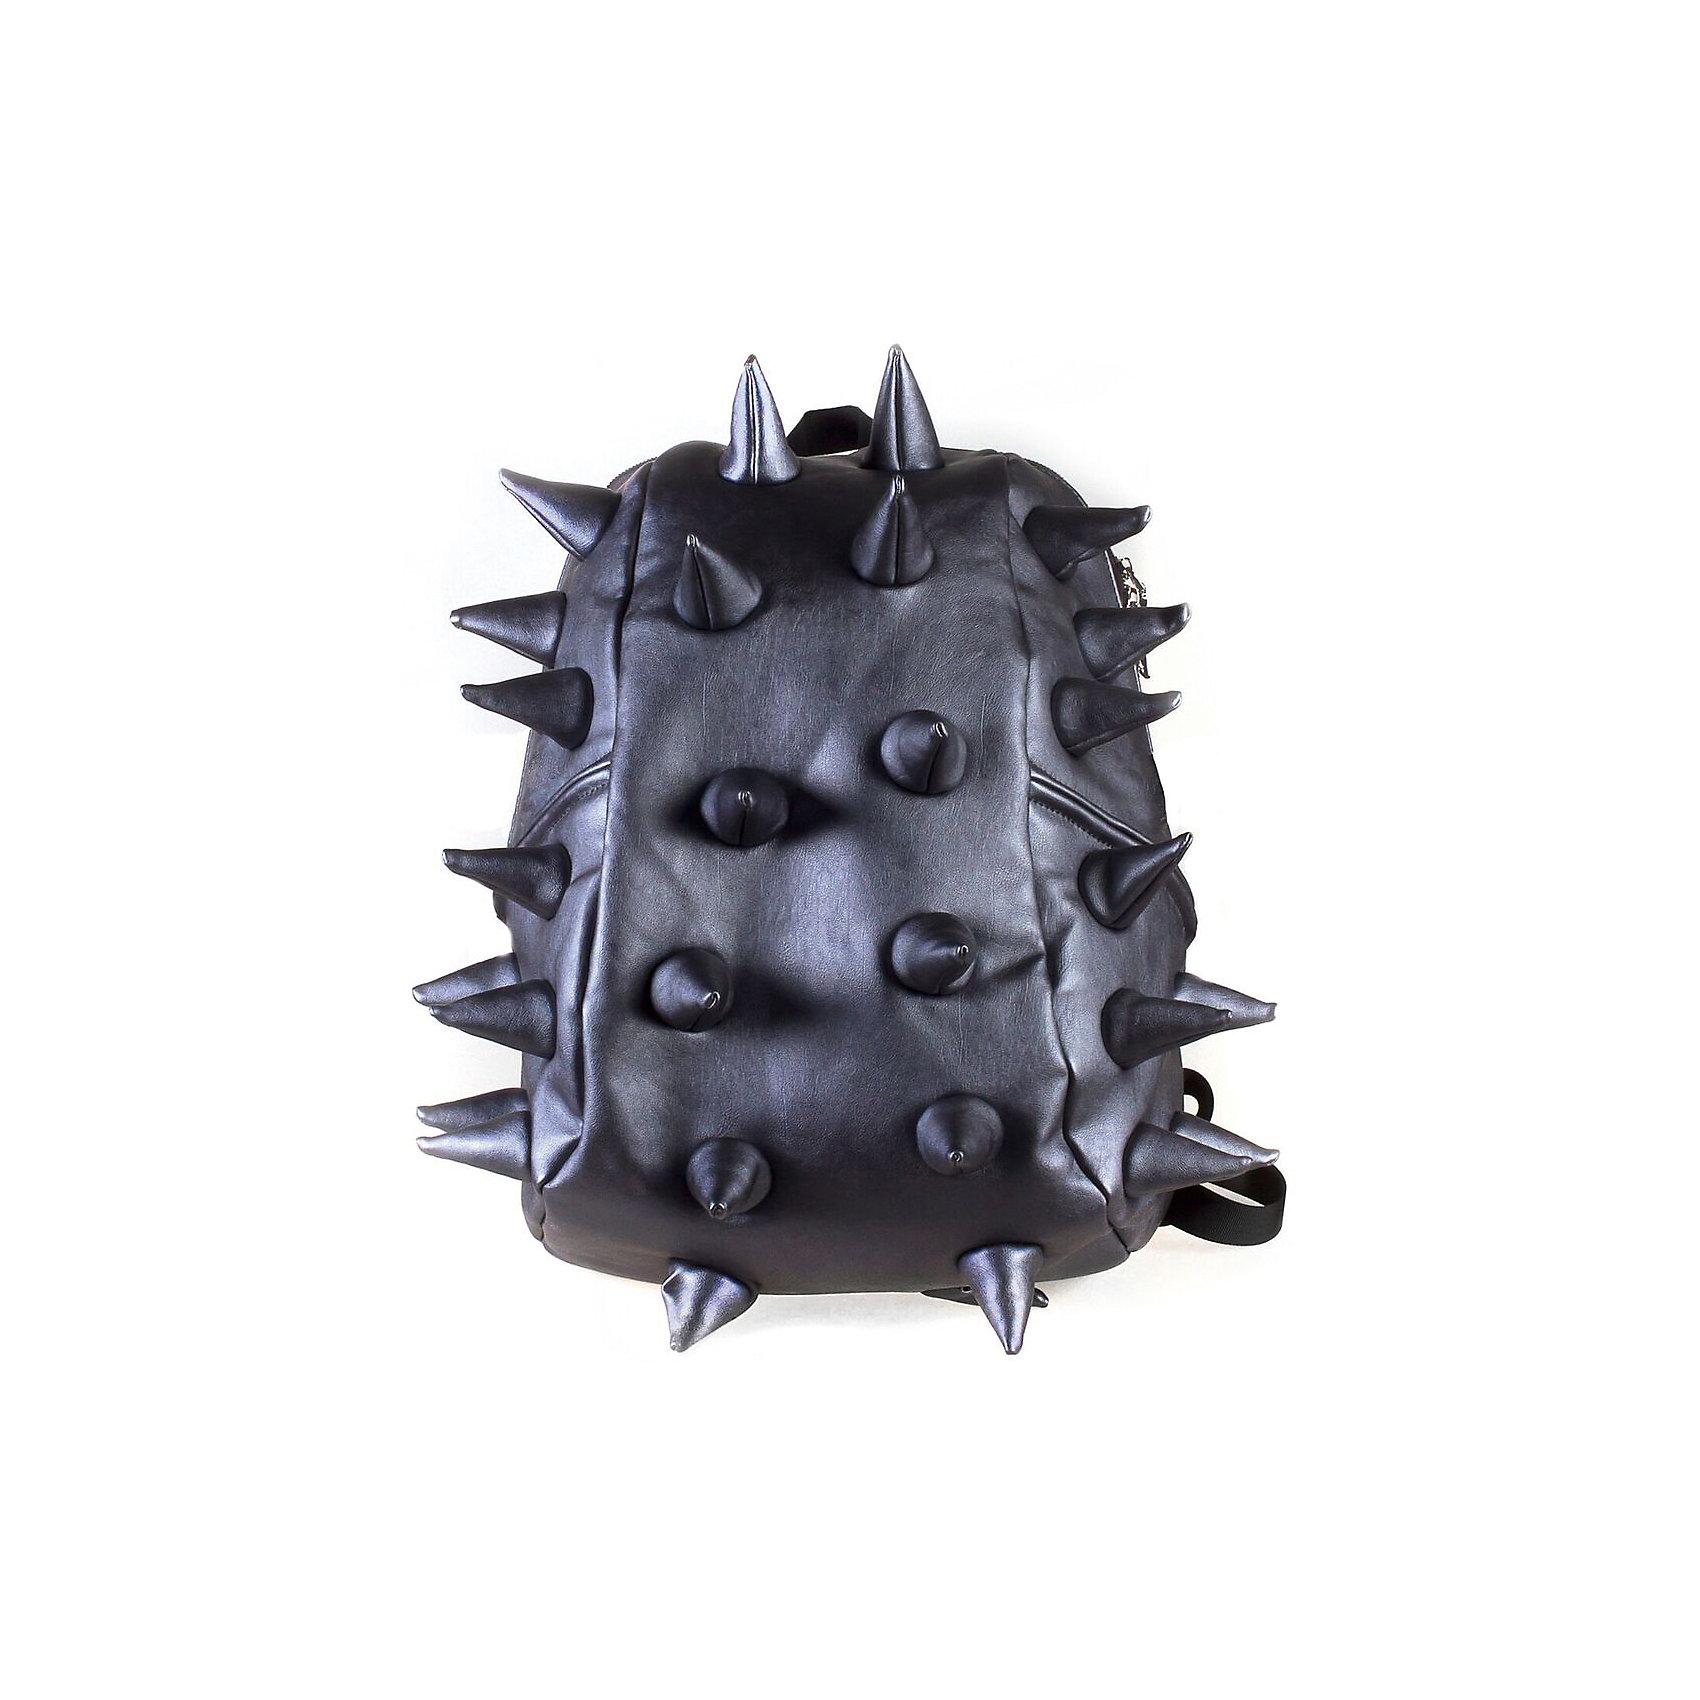 Рюкзак Rex Half Heavy Metal Spike Blue, цвет синийРюкзаки<br>Вес: 0,6 кг<br>Размер: 36х30х15 см<br>Состав: рюкзак<br>Наличие светоотражающих элементов: нет<br>Материал: полиуретан<br><br>Ширина мм: 360<br>Глубина мм: 300<br>Высота мм: 150<br>Вес г: 600<br>Возраст от месяцев: 36<br>Возраст до месяцев: 720<br>Пол: Унисекс<br>Возраст: Детский<br>SKU: 7054106